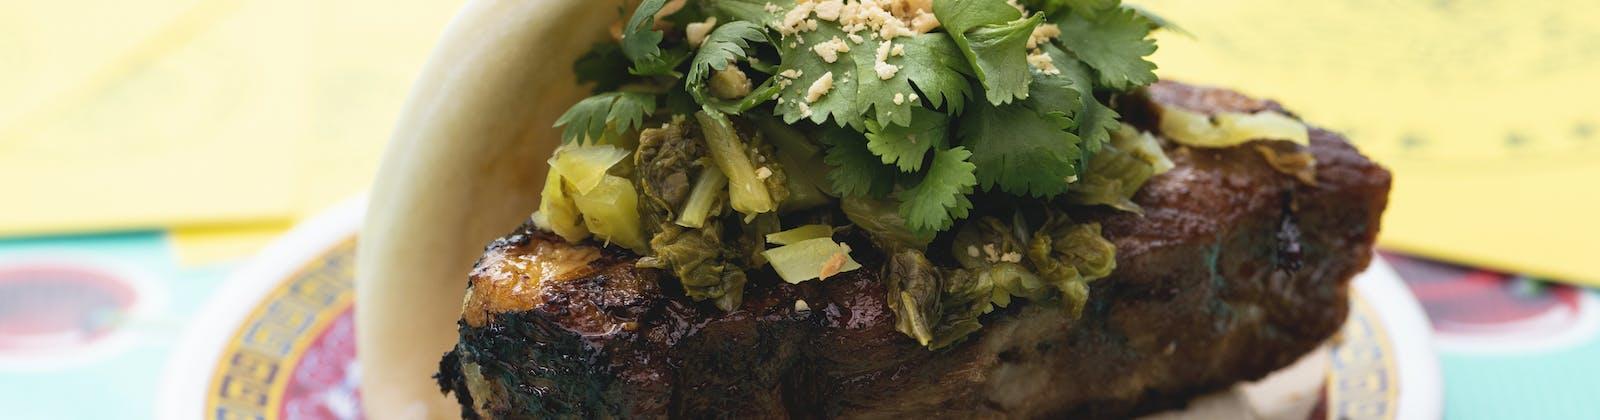 braised pork leg in a bao bun with coriander